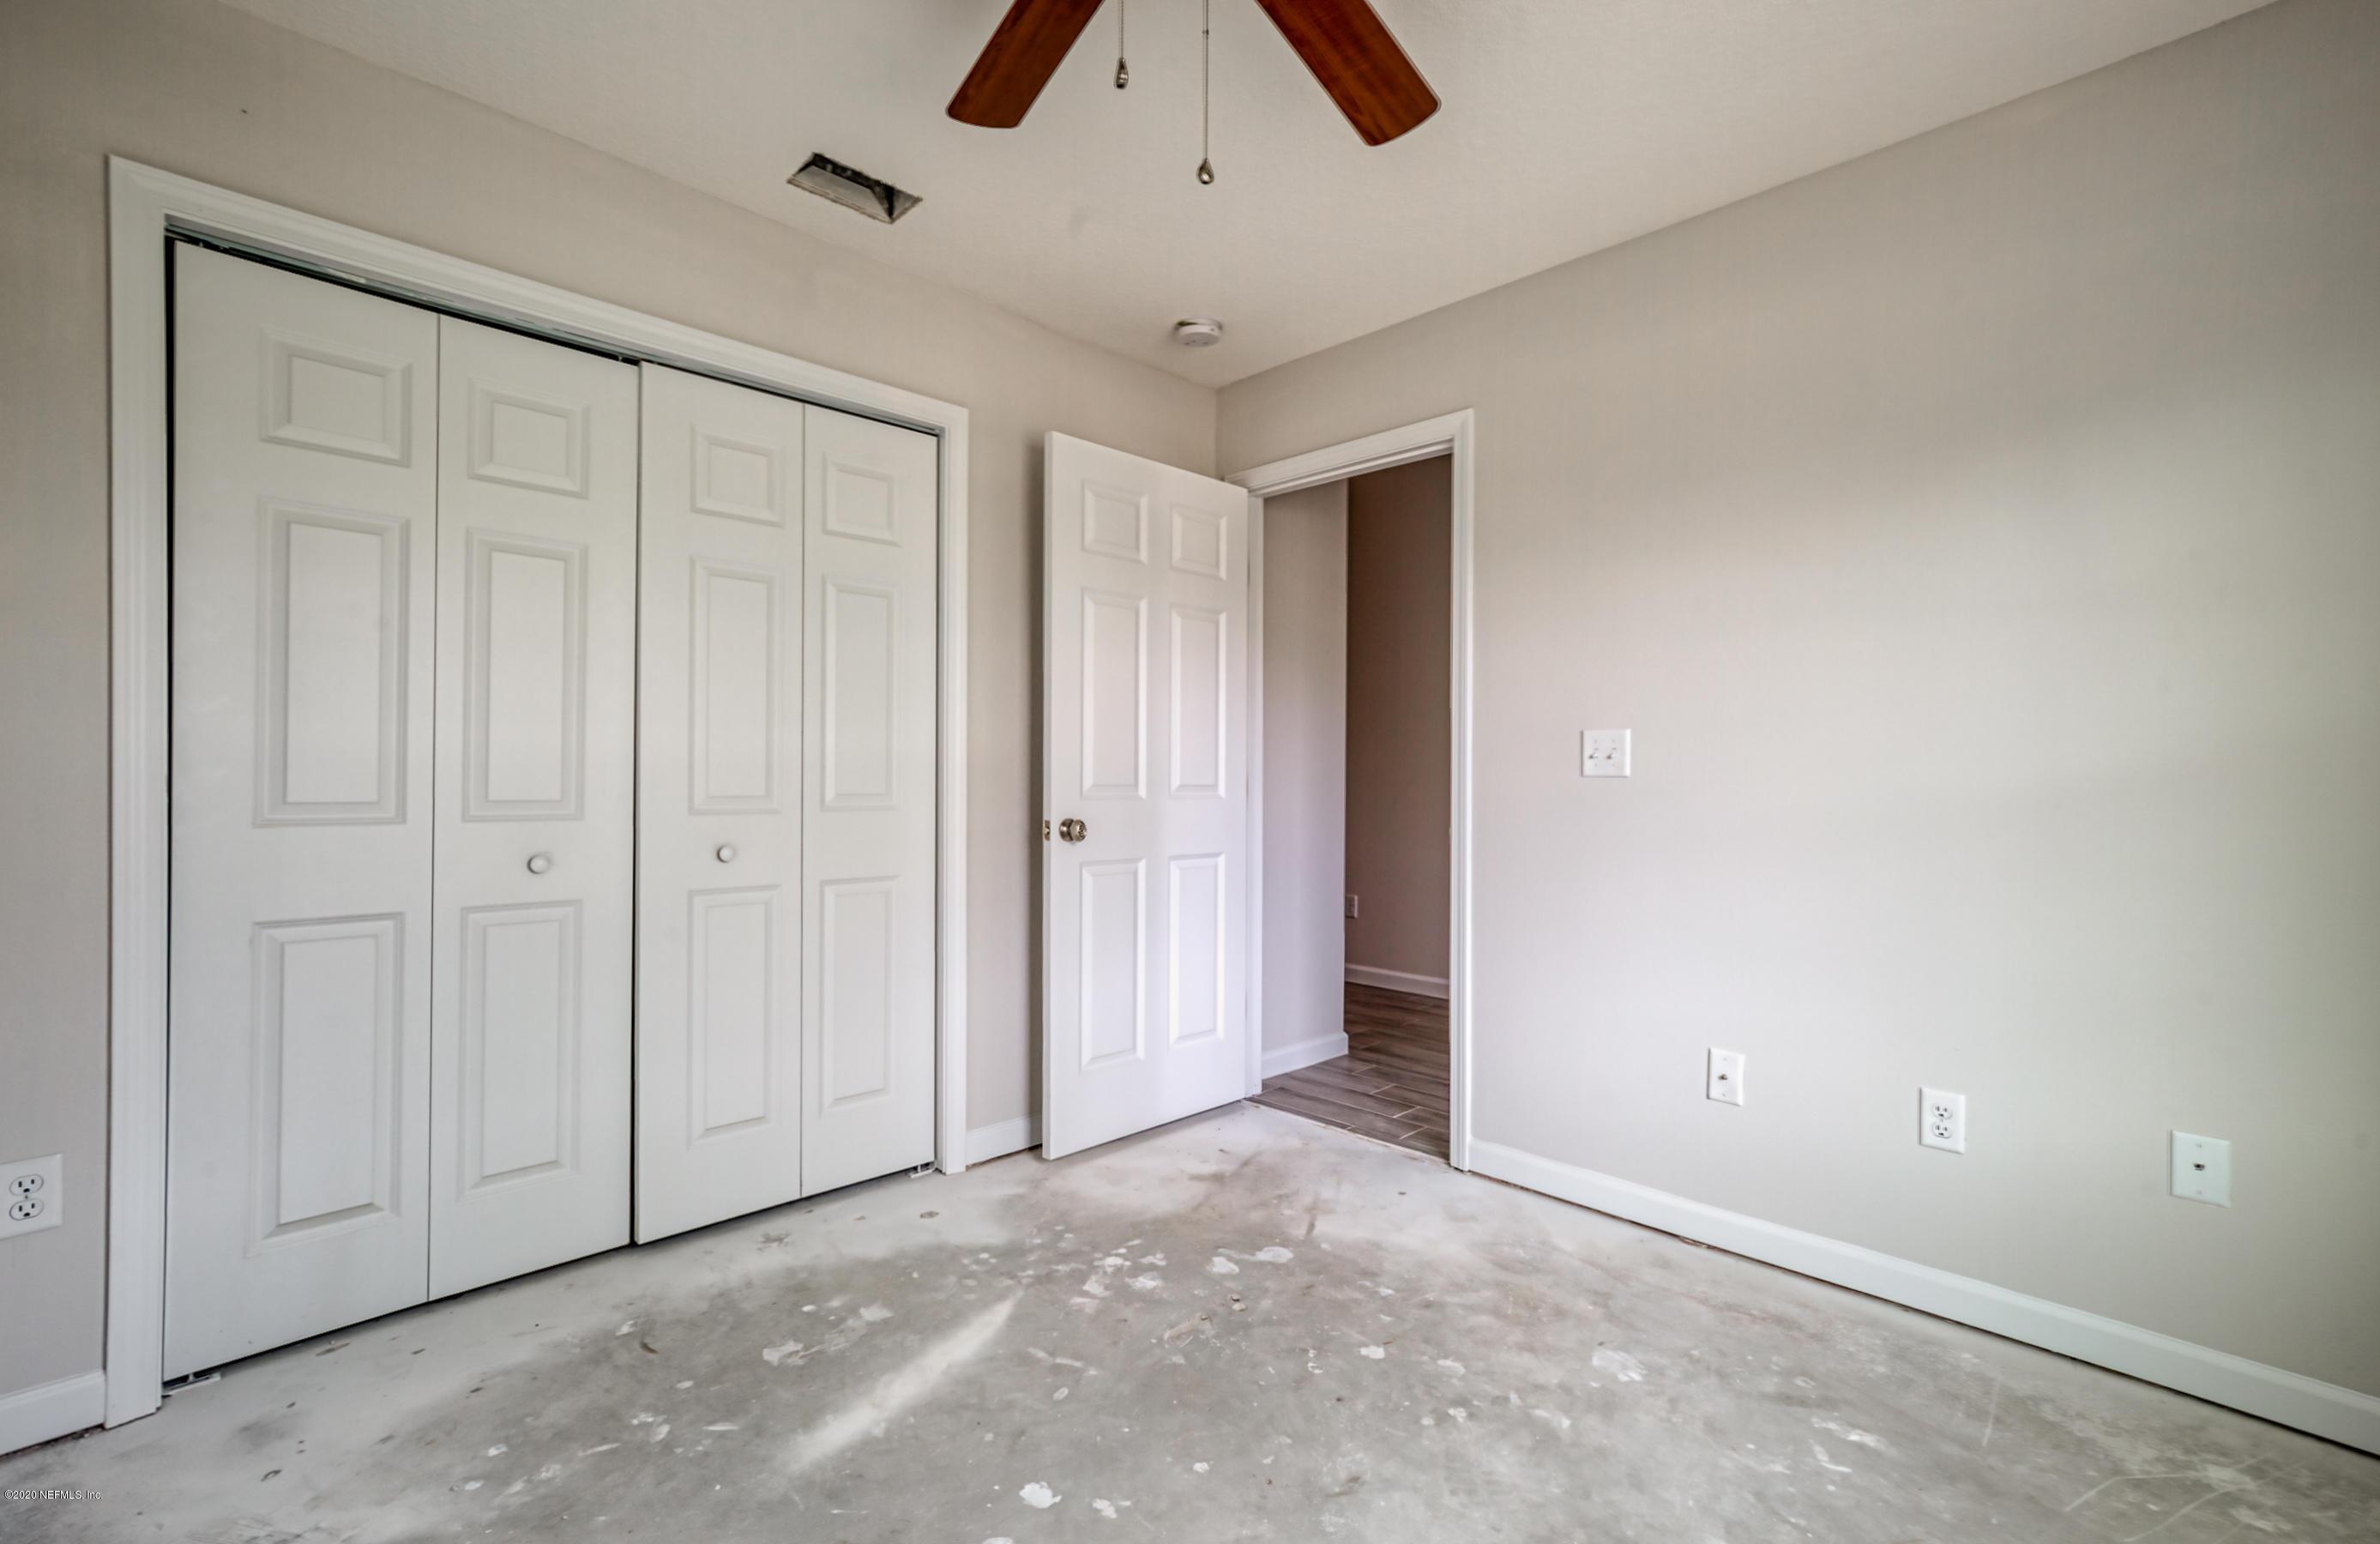 6069 PATRIOTS LANDING, JACKSONVILLE, FLORIDA 32244, 4 Bedrooms Bedrooms, ,2 BathroomsBathrooms,Residential,For sale,PATRIOTS LANDING,1031560